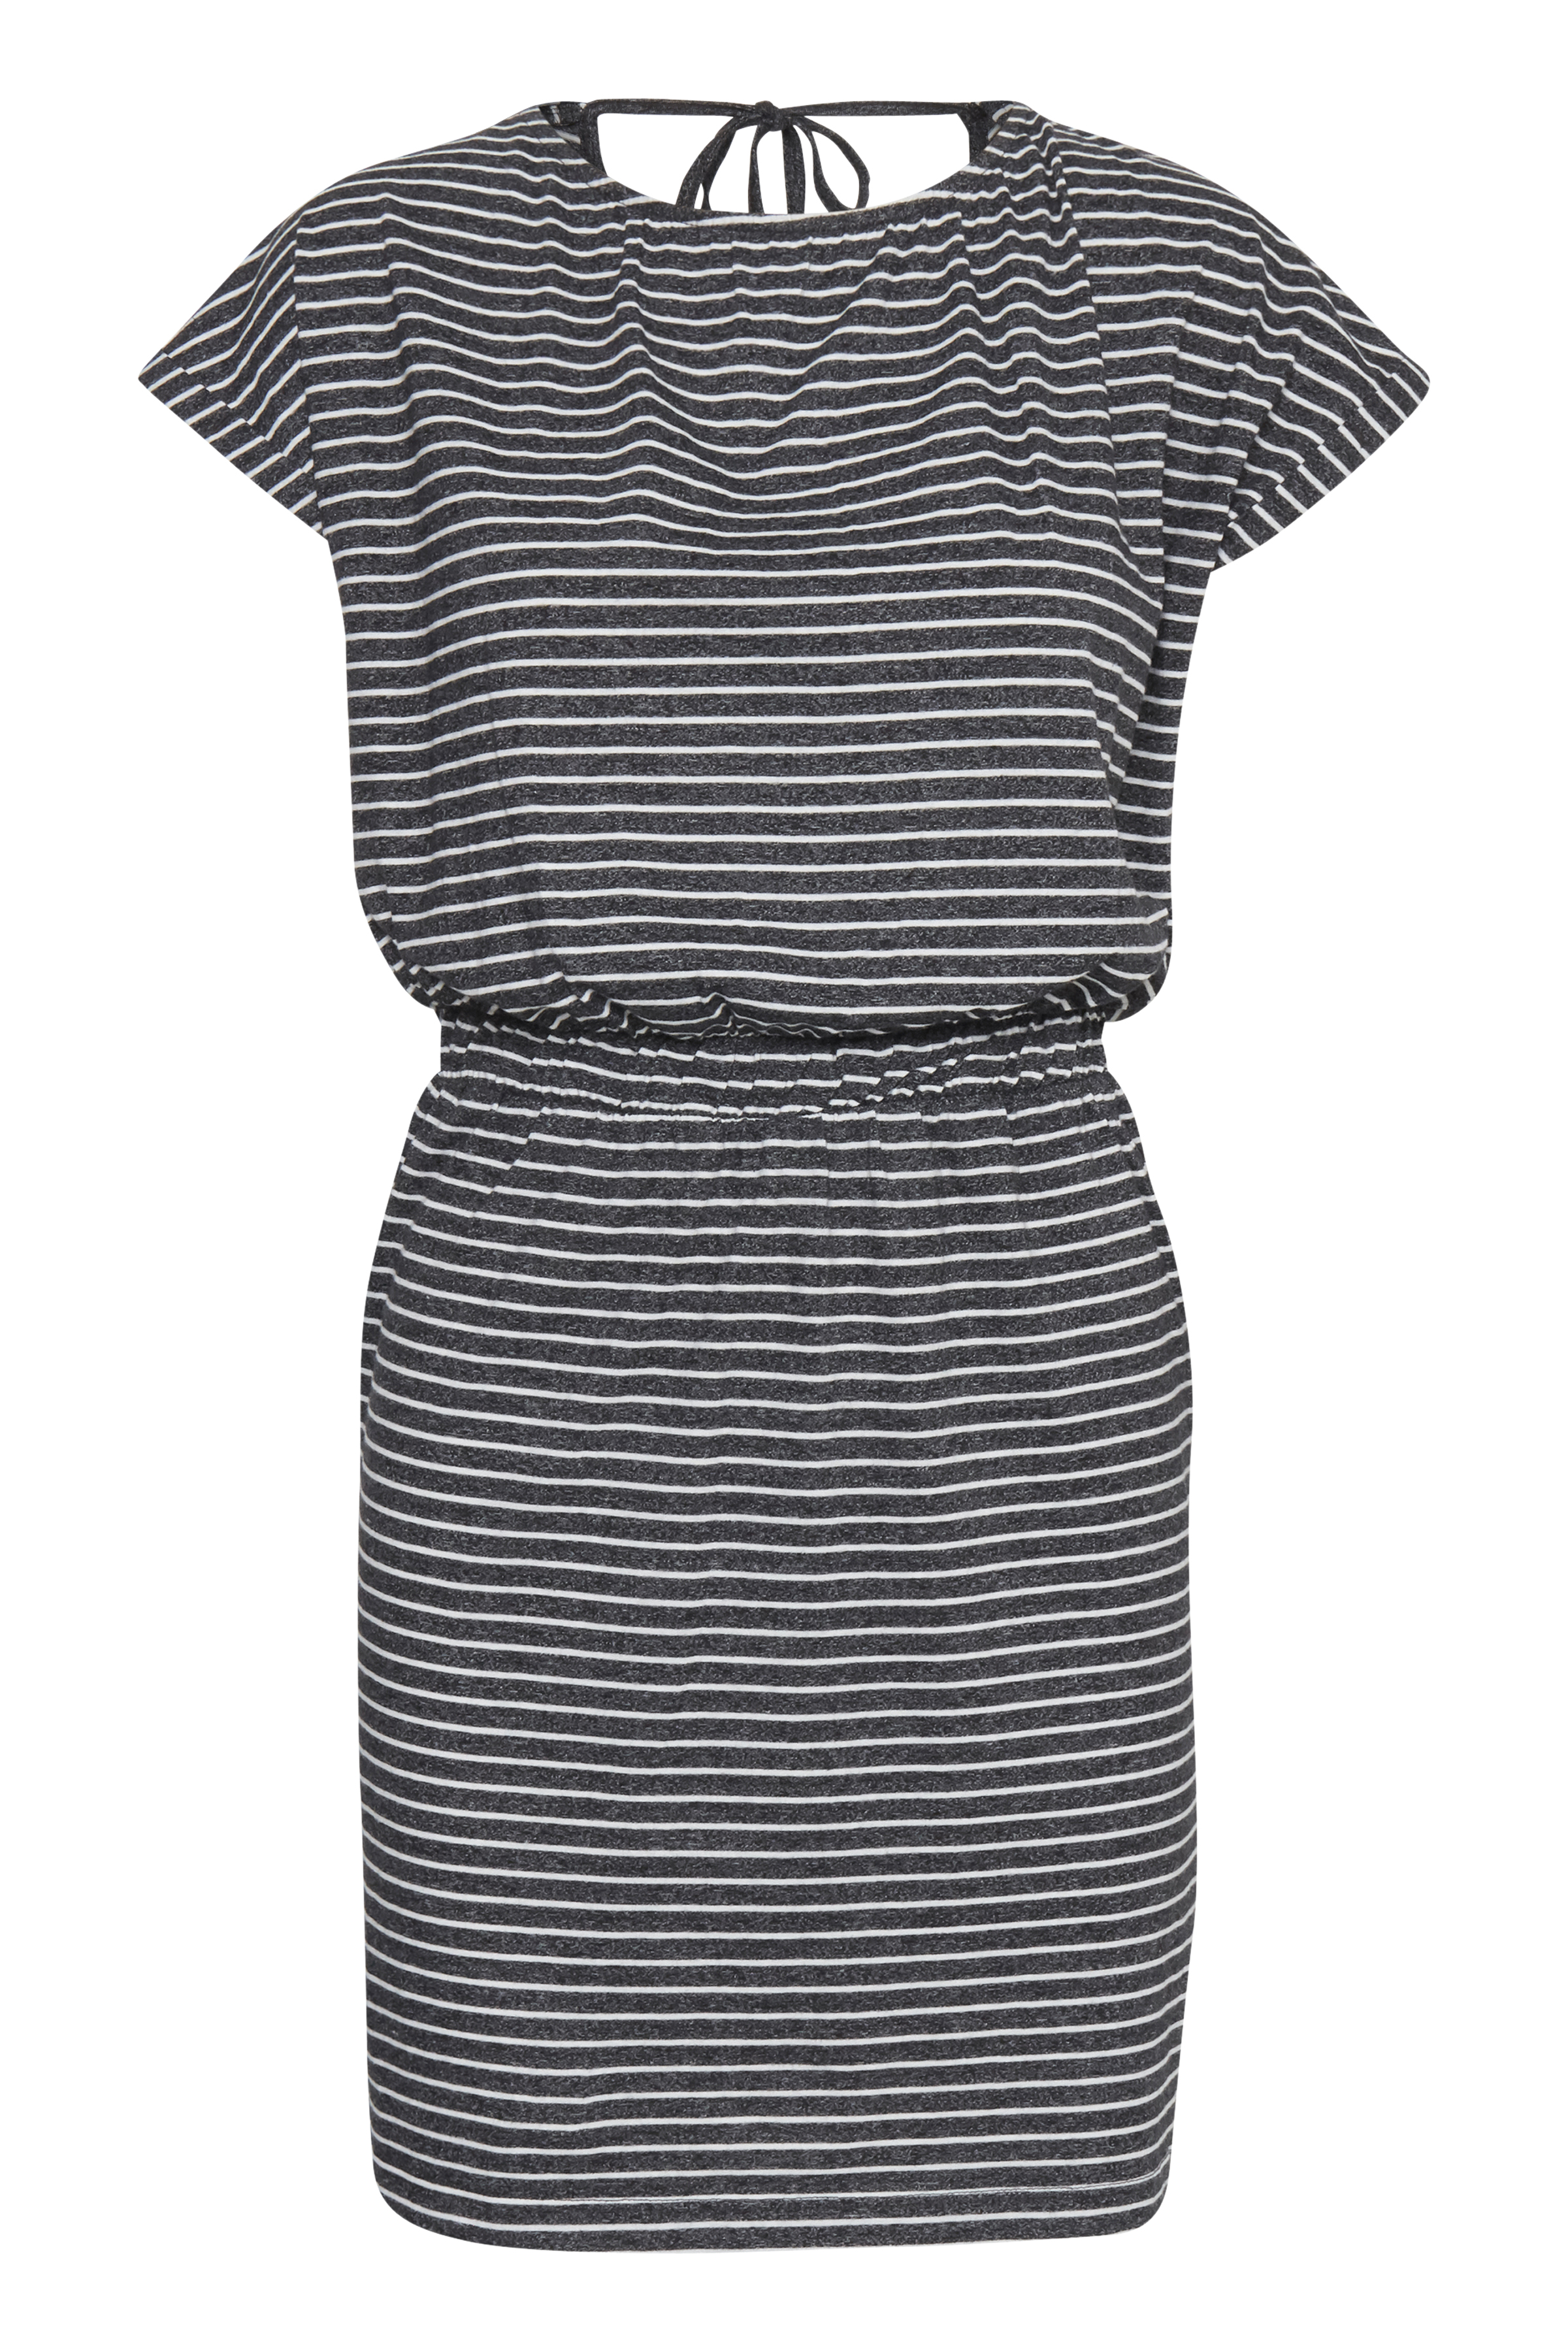 Small Stripe Black Jerseykjole – Køb Small Stripe Black Jerseykjole fra str. S-XL her